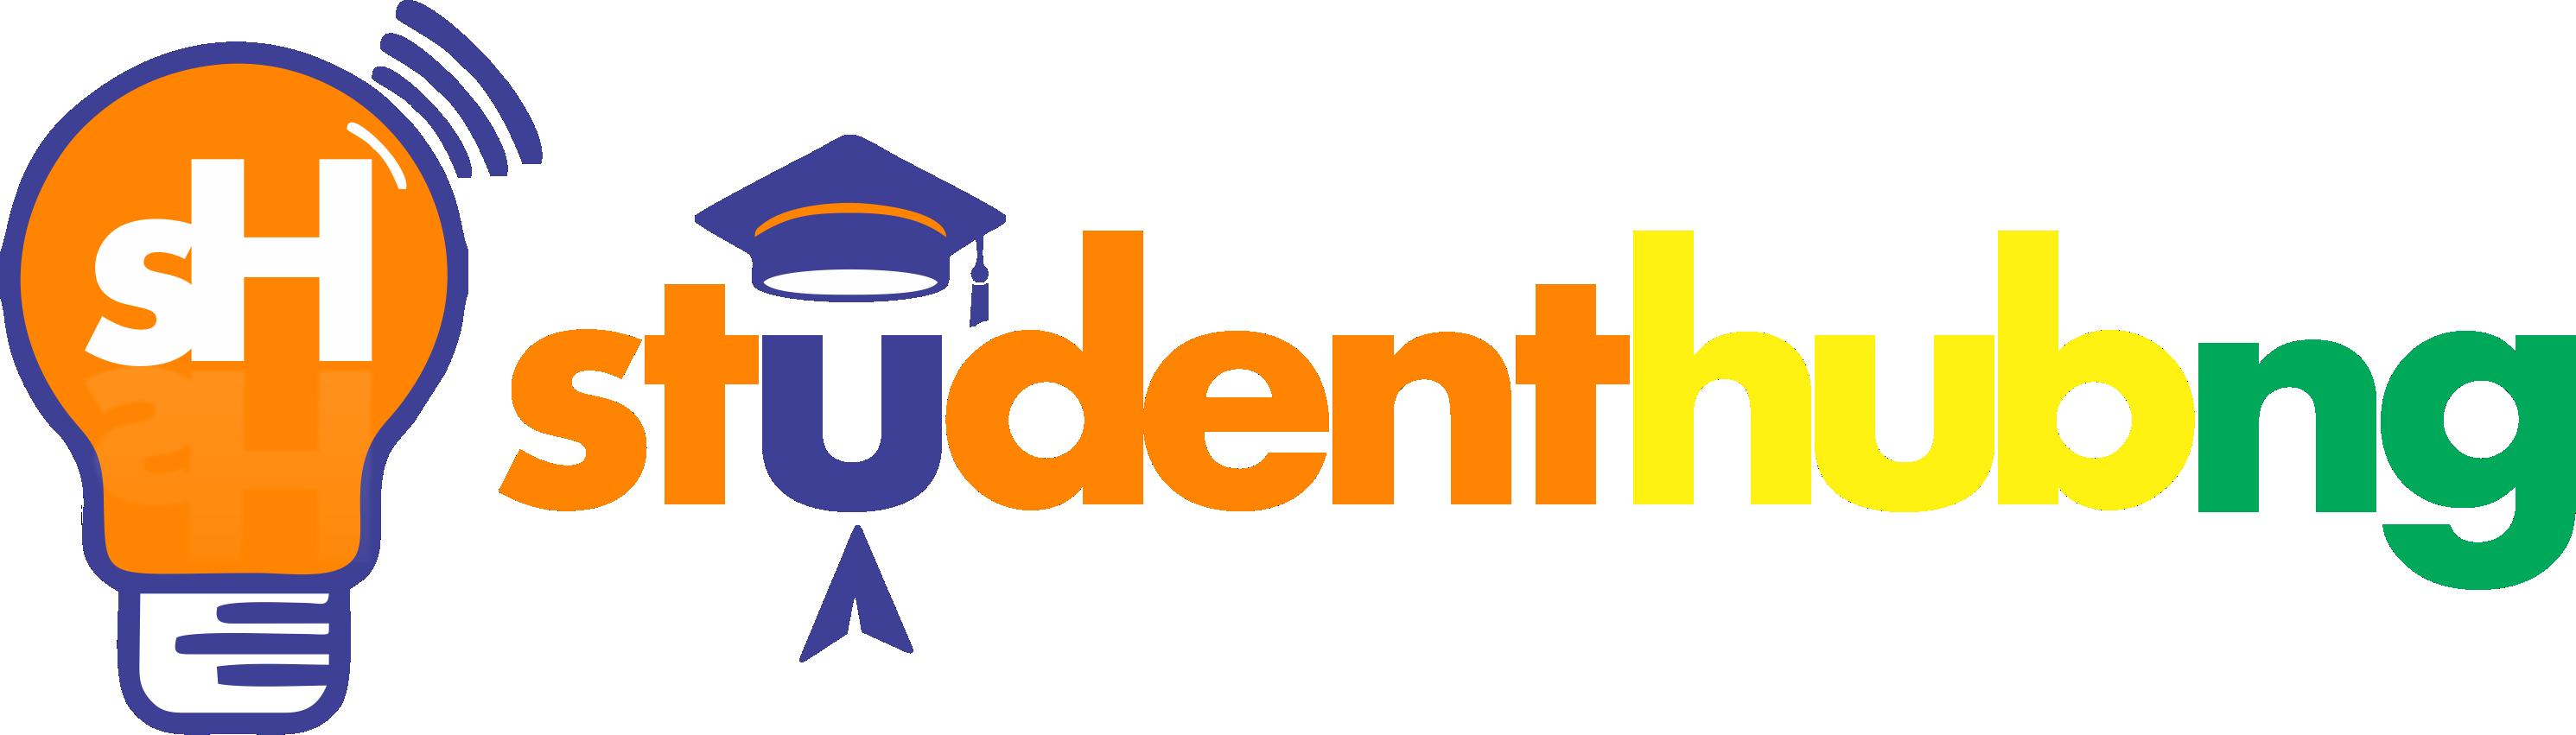 studenthubnglogo (1)